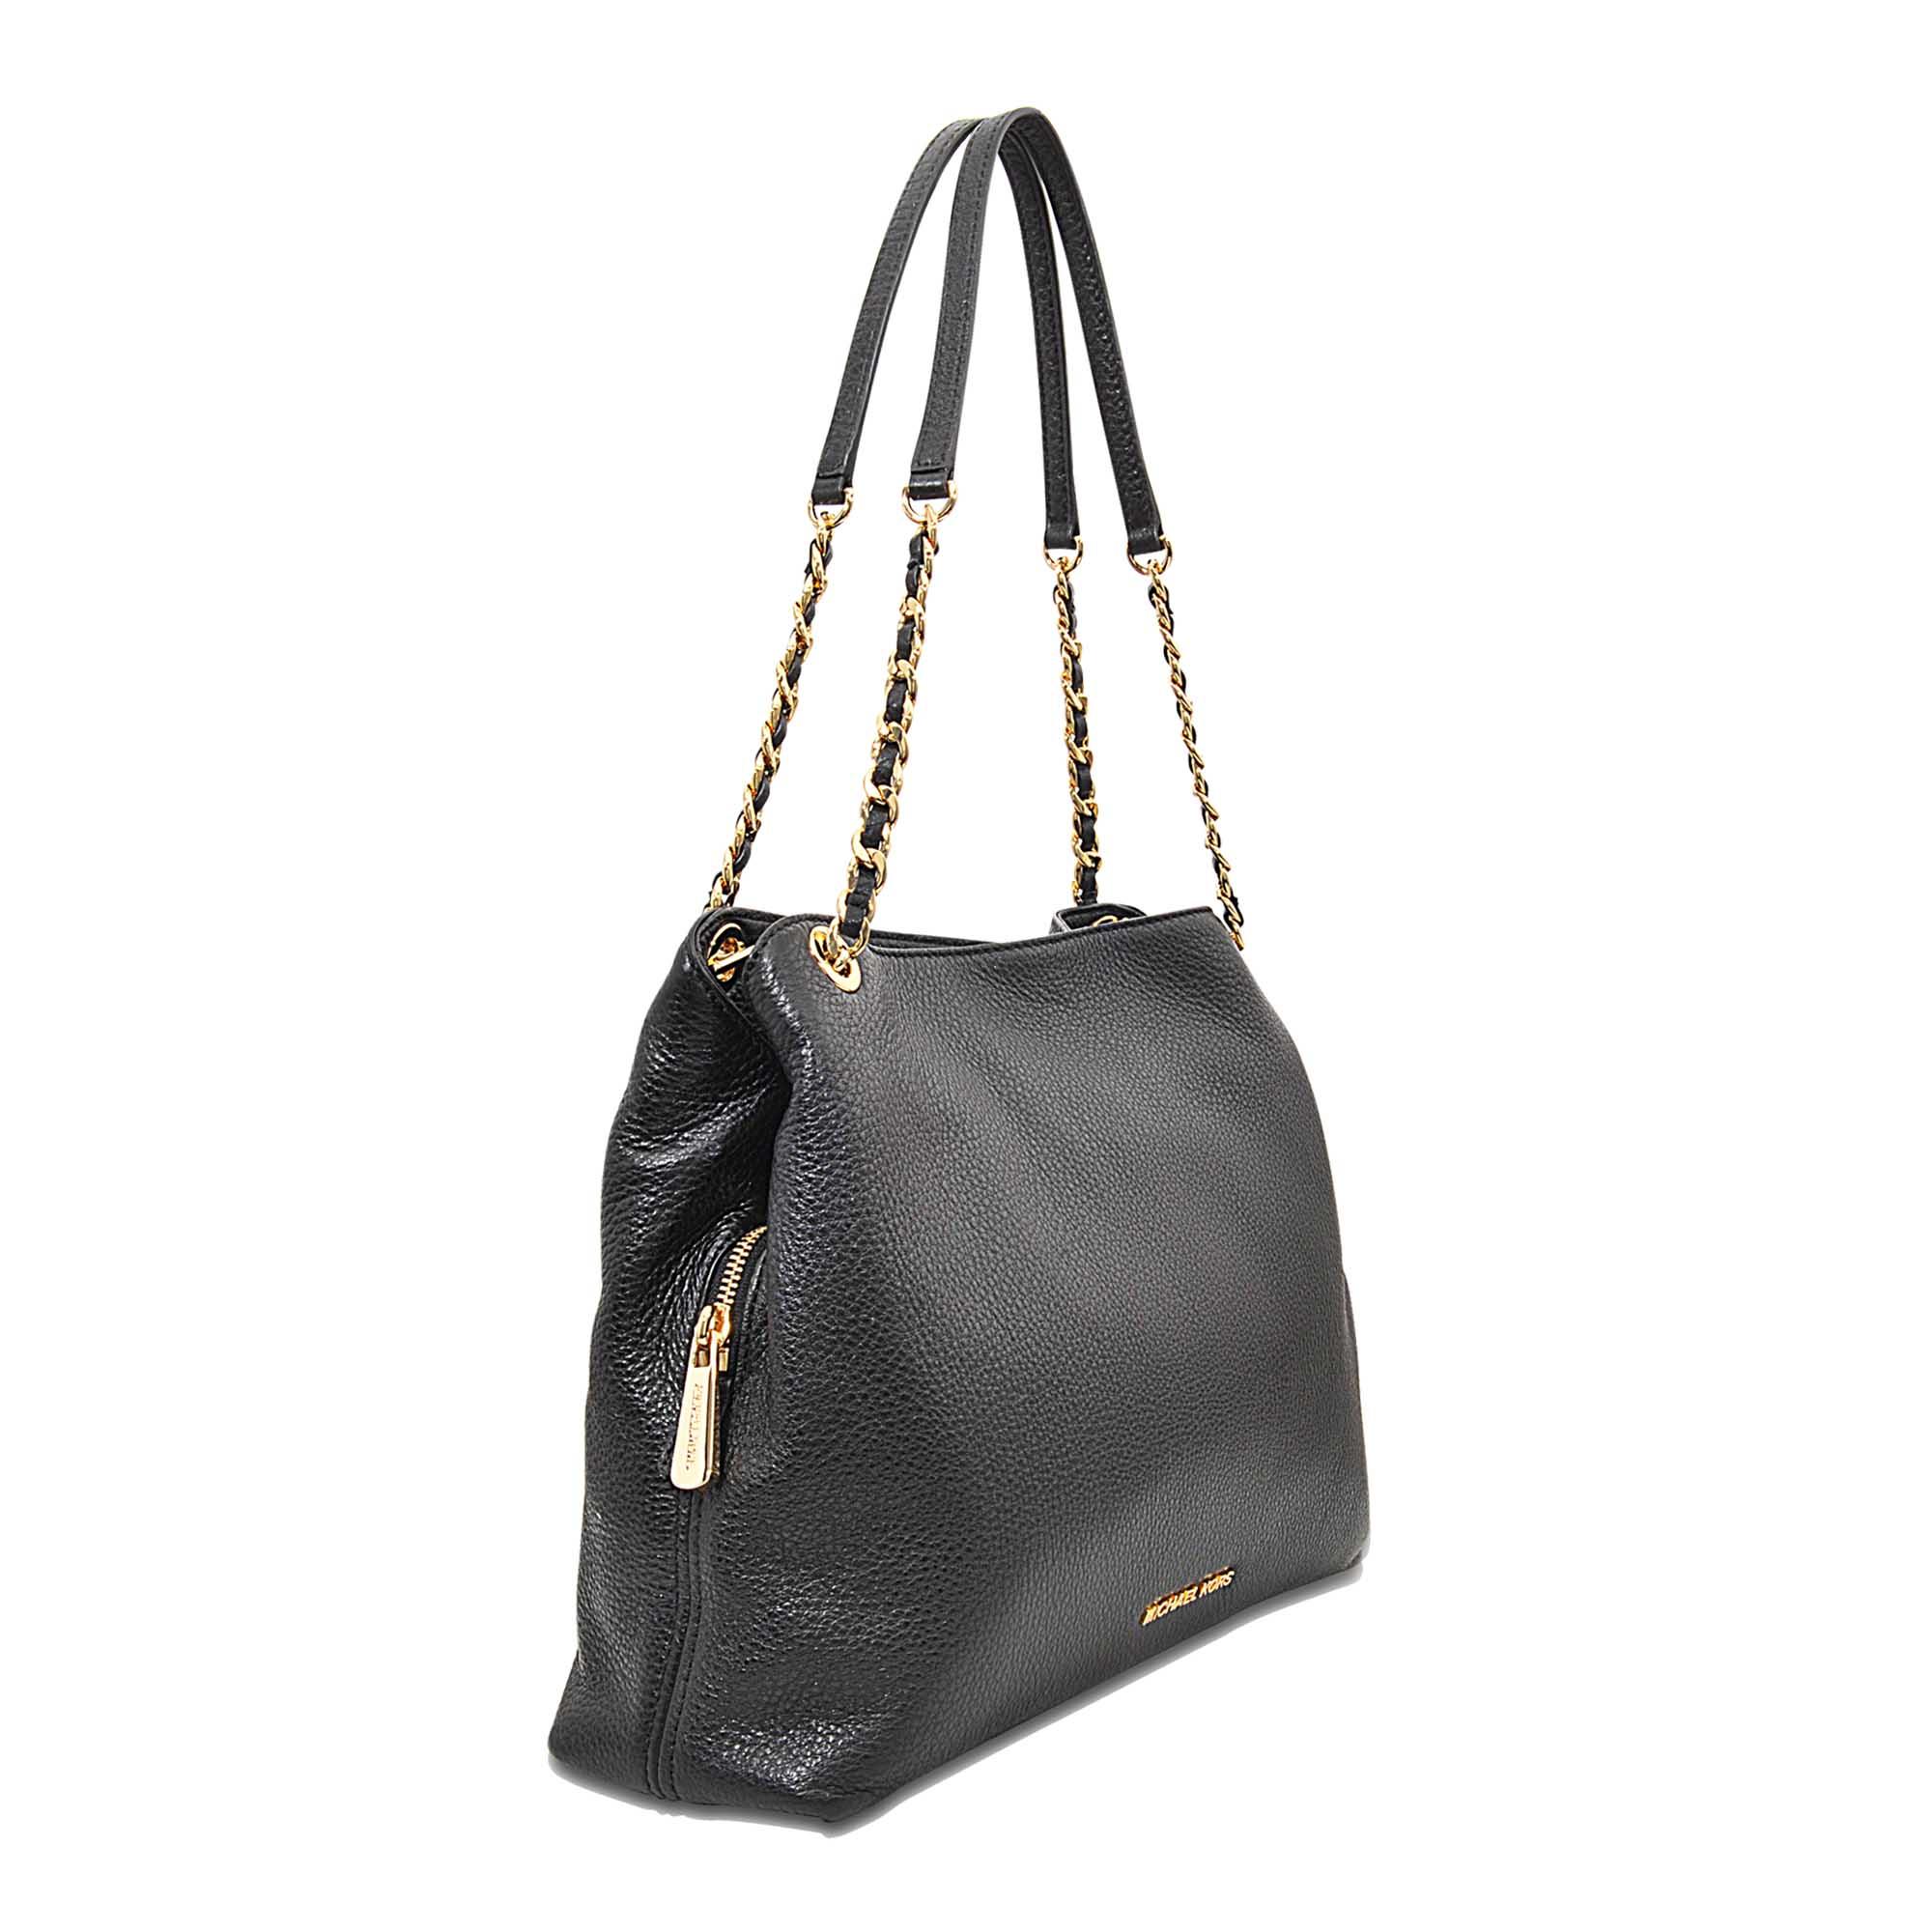 d9c3d6dae8b5 MICHAEL Michael Kors Jet Set Chain Item Lg Chain Shoulder Bag in ...